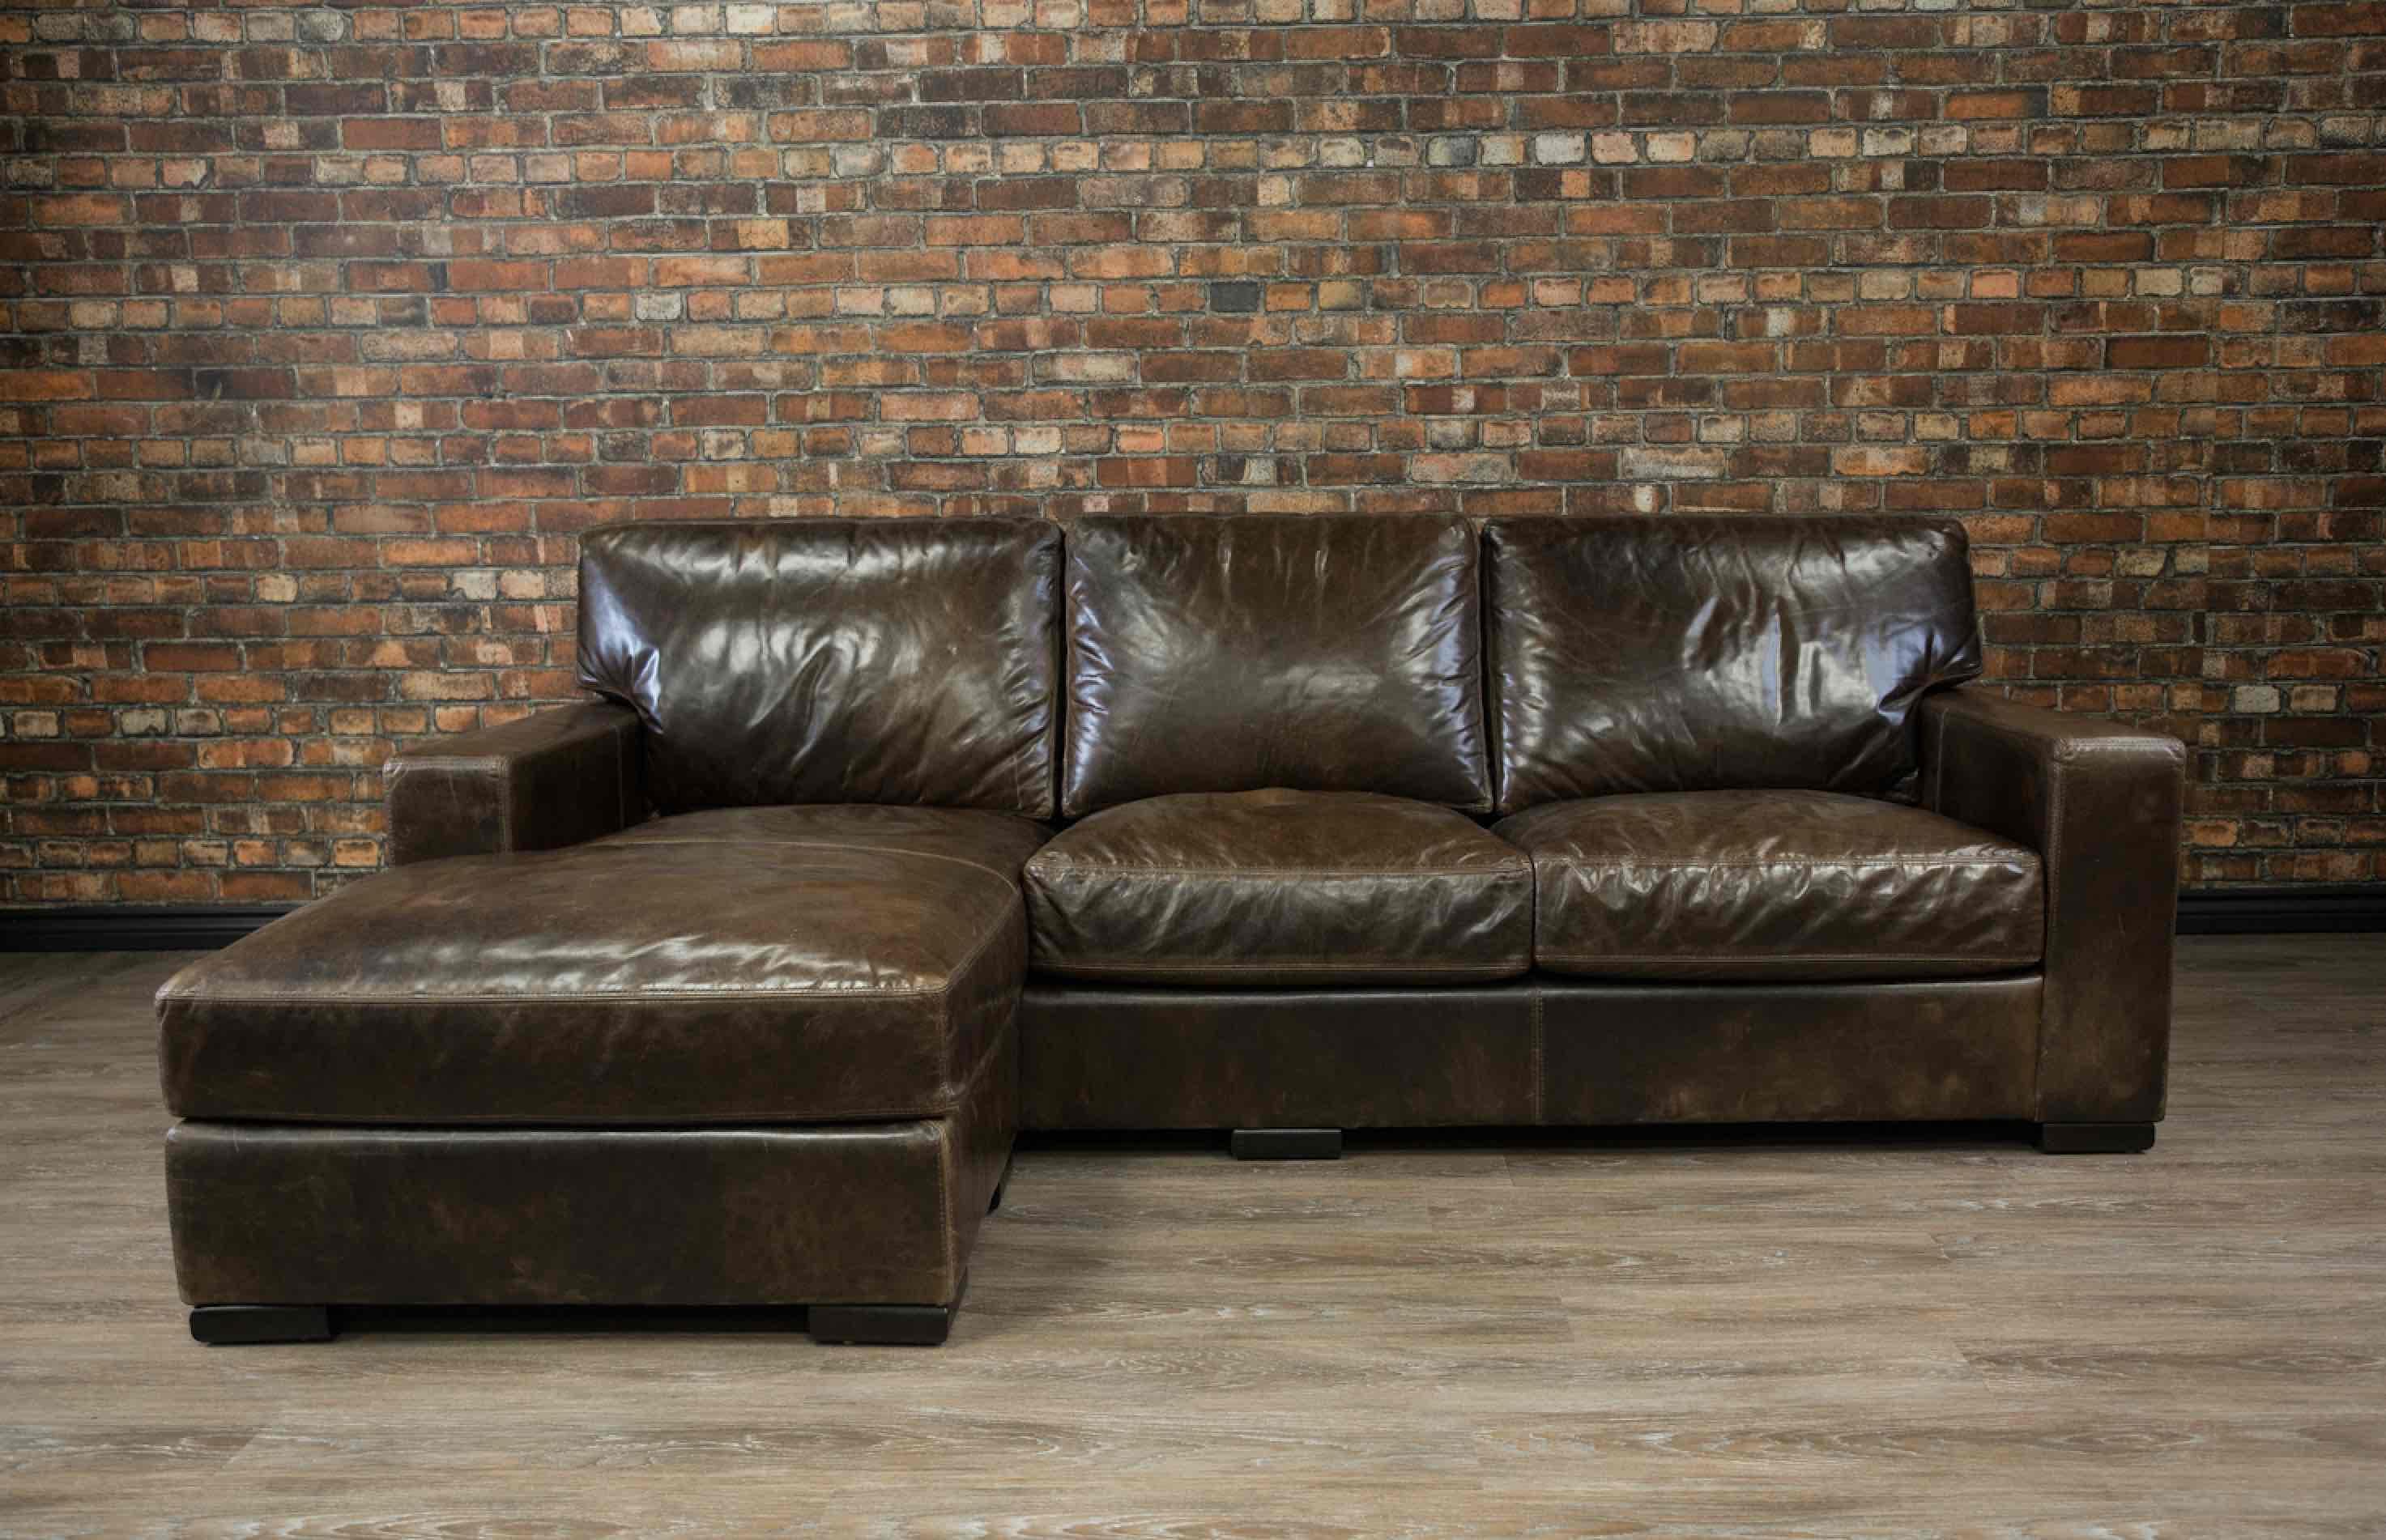 extra deep sofa canada ara futon bed with storage seat leather catosfera